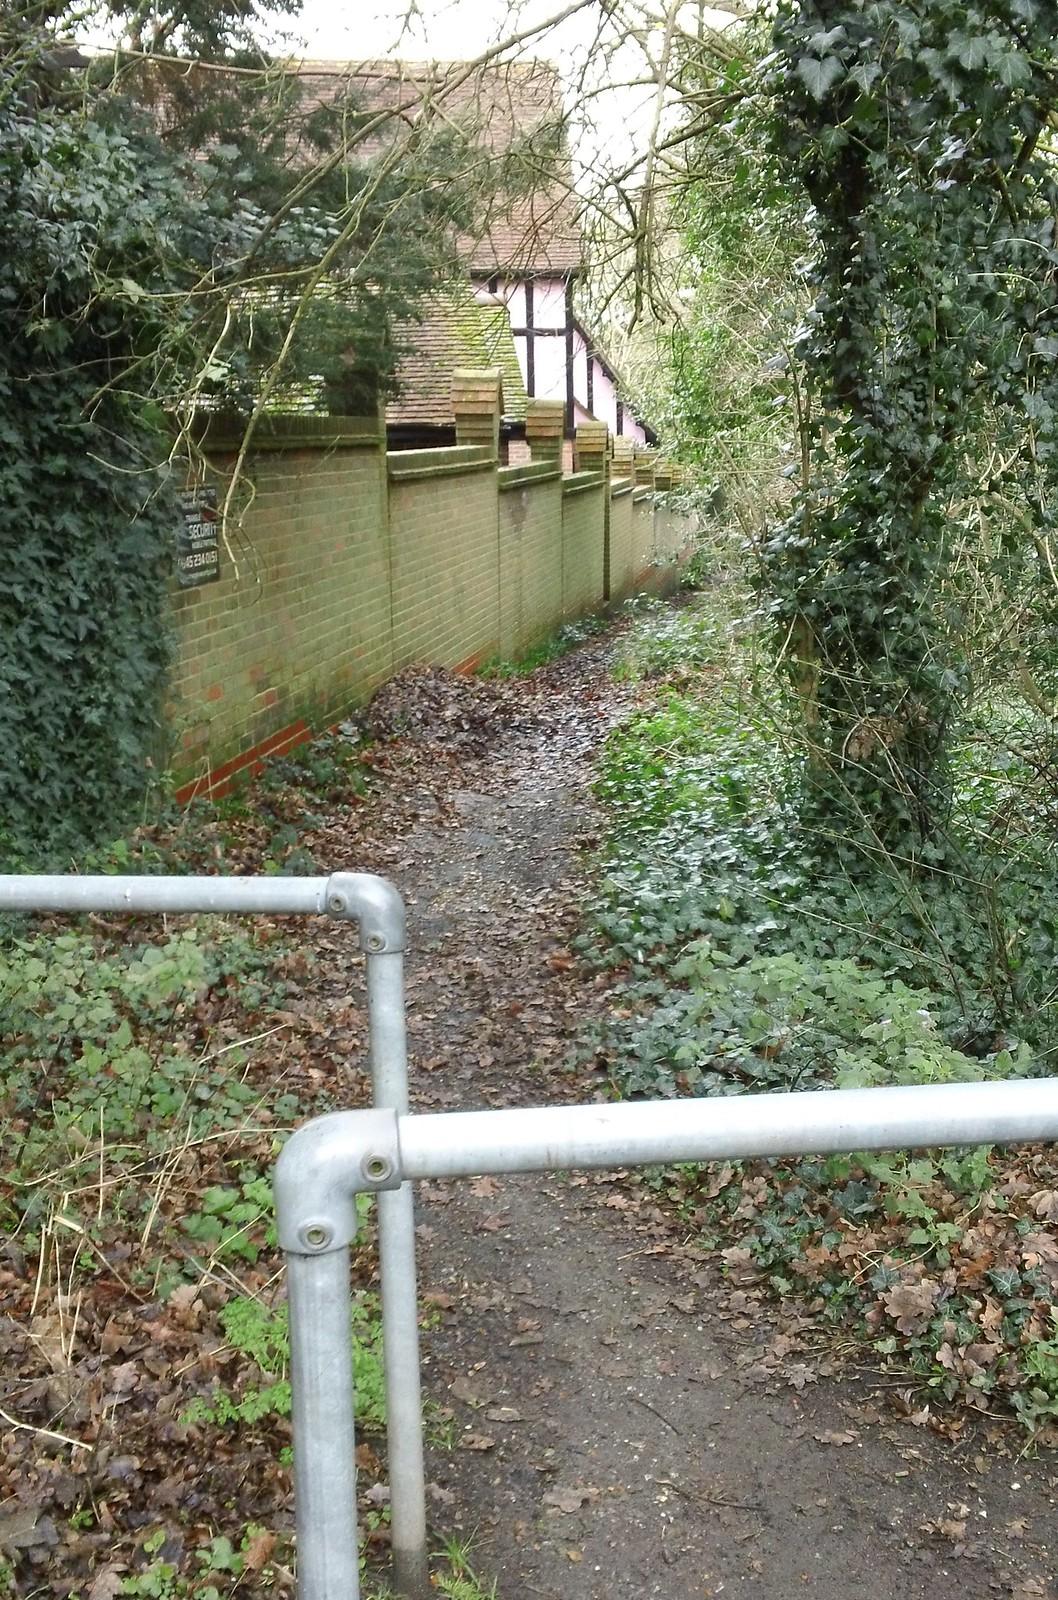 Last rustic view before Loughton suburbs